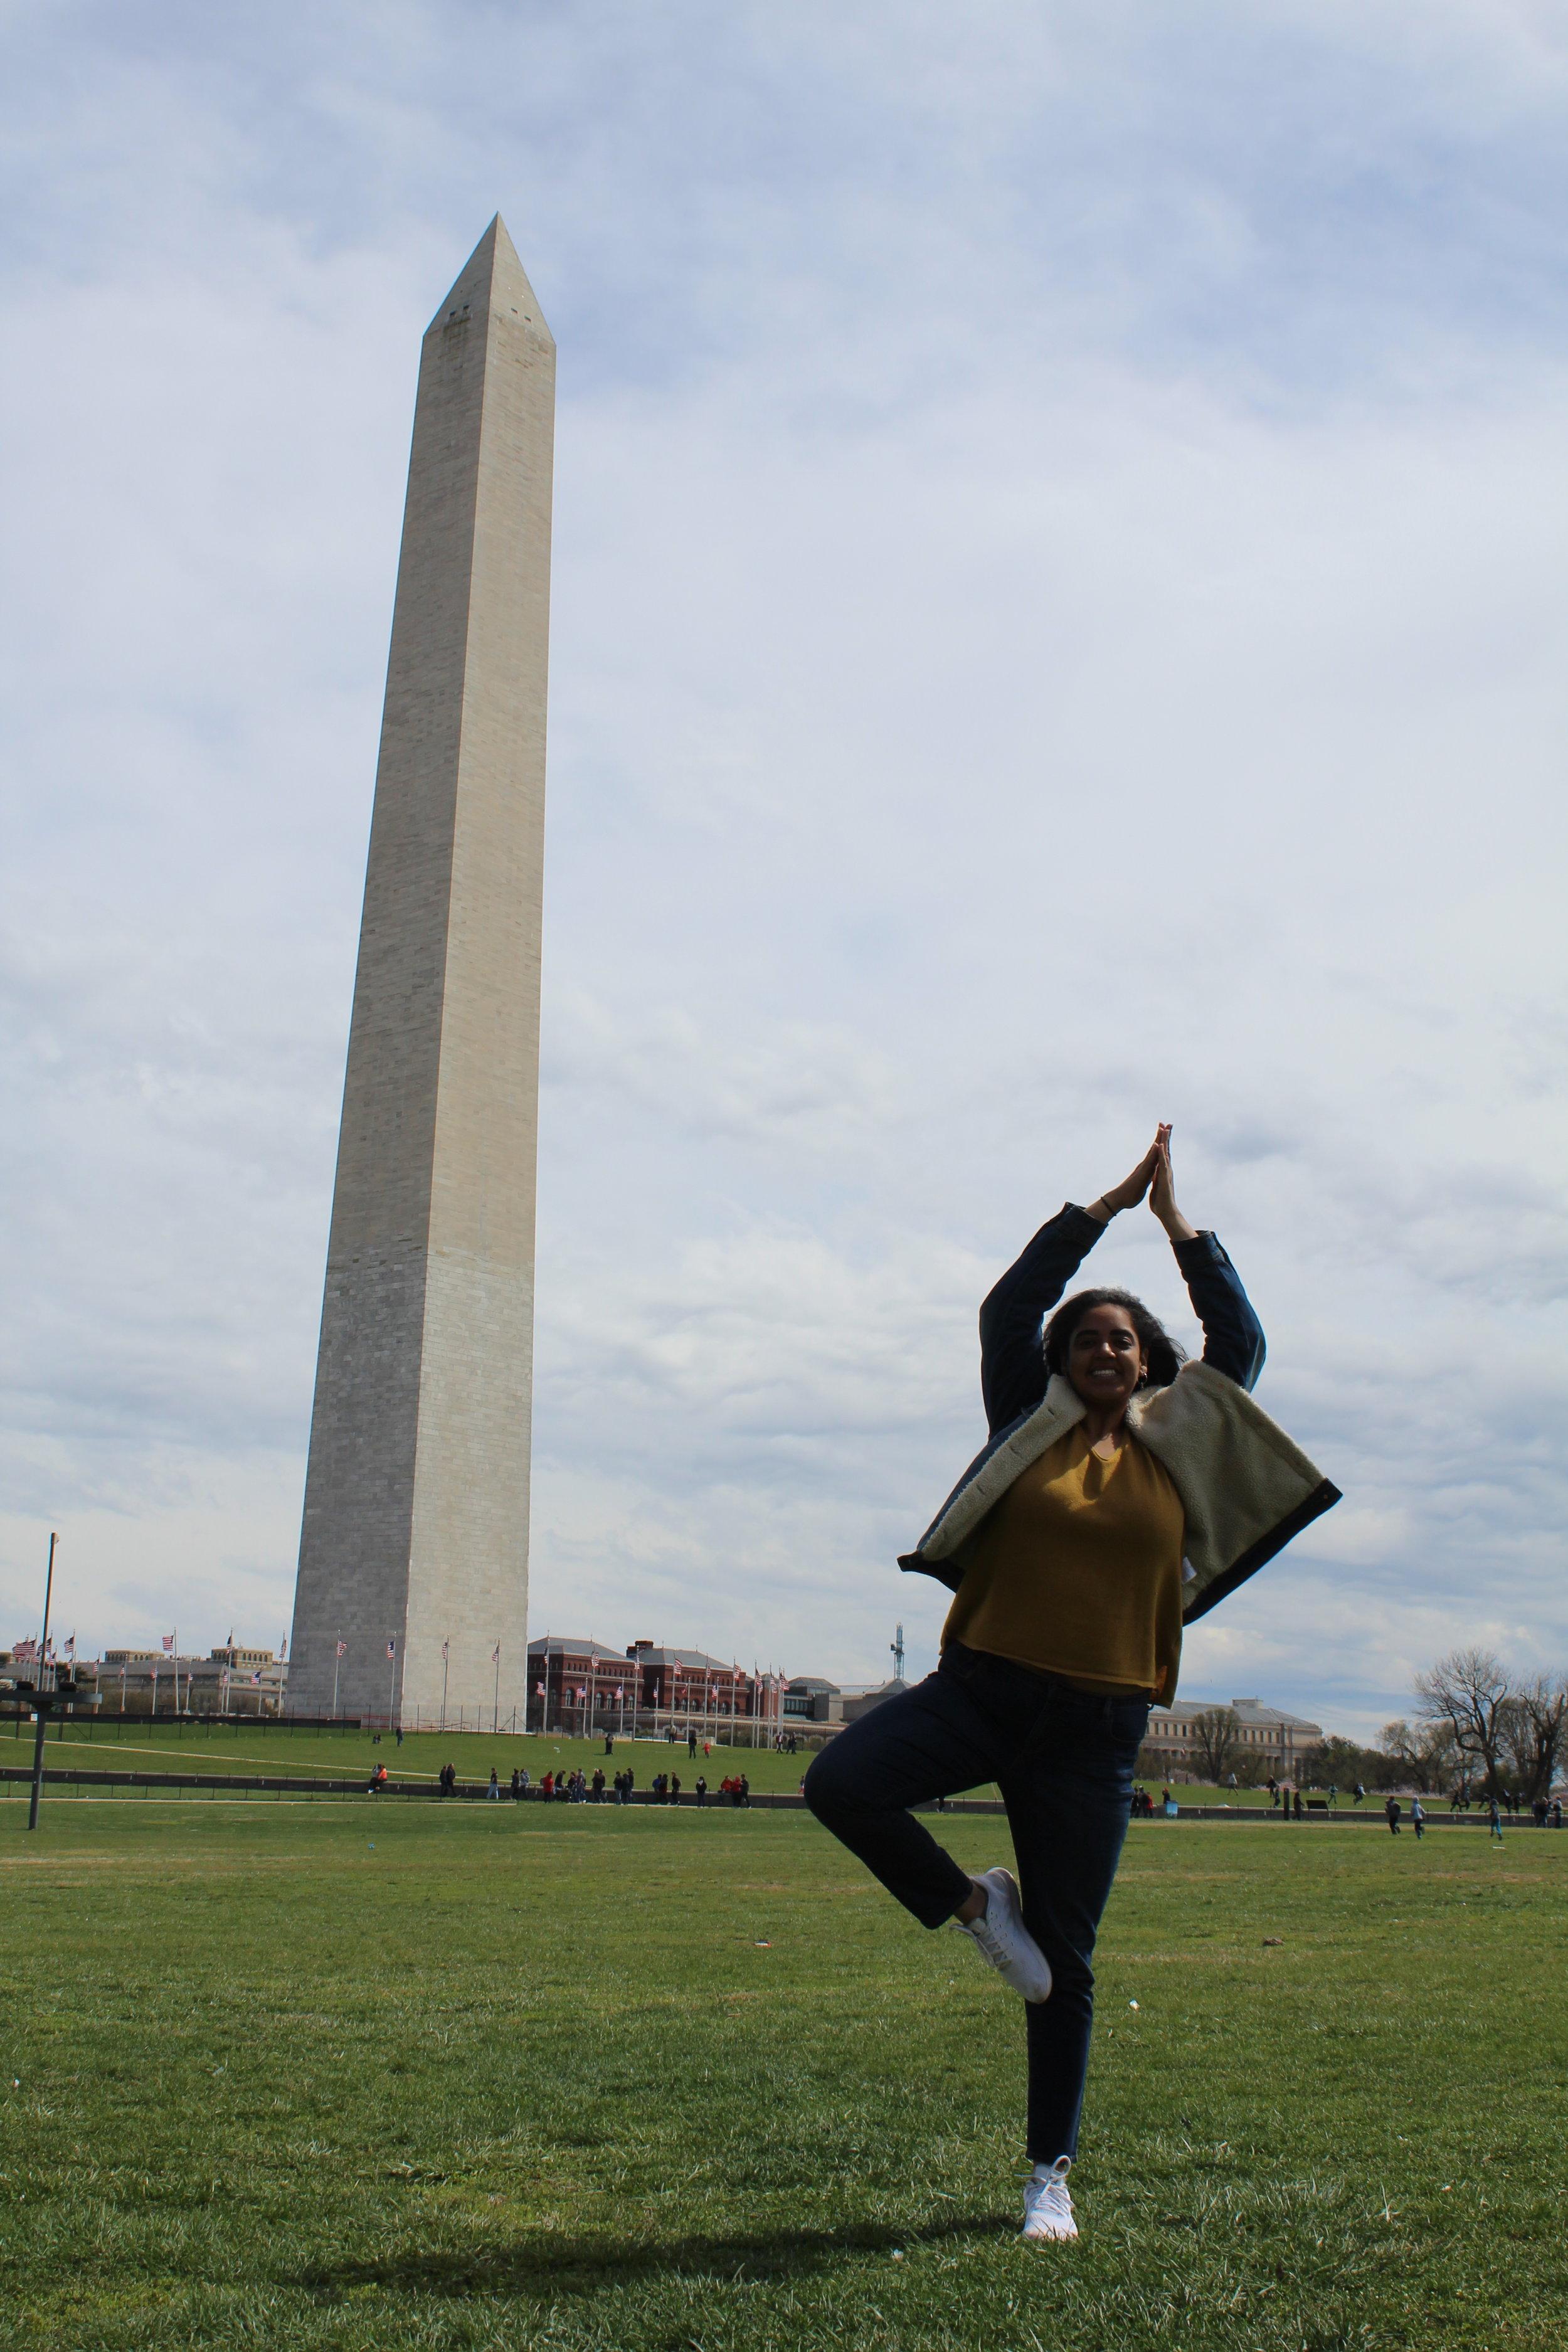 Doing my best imitation of the Washington Monument in Washington D.C.